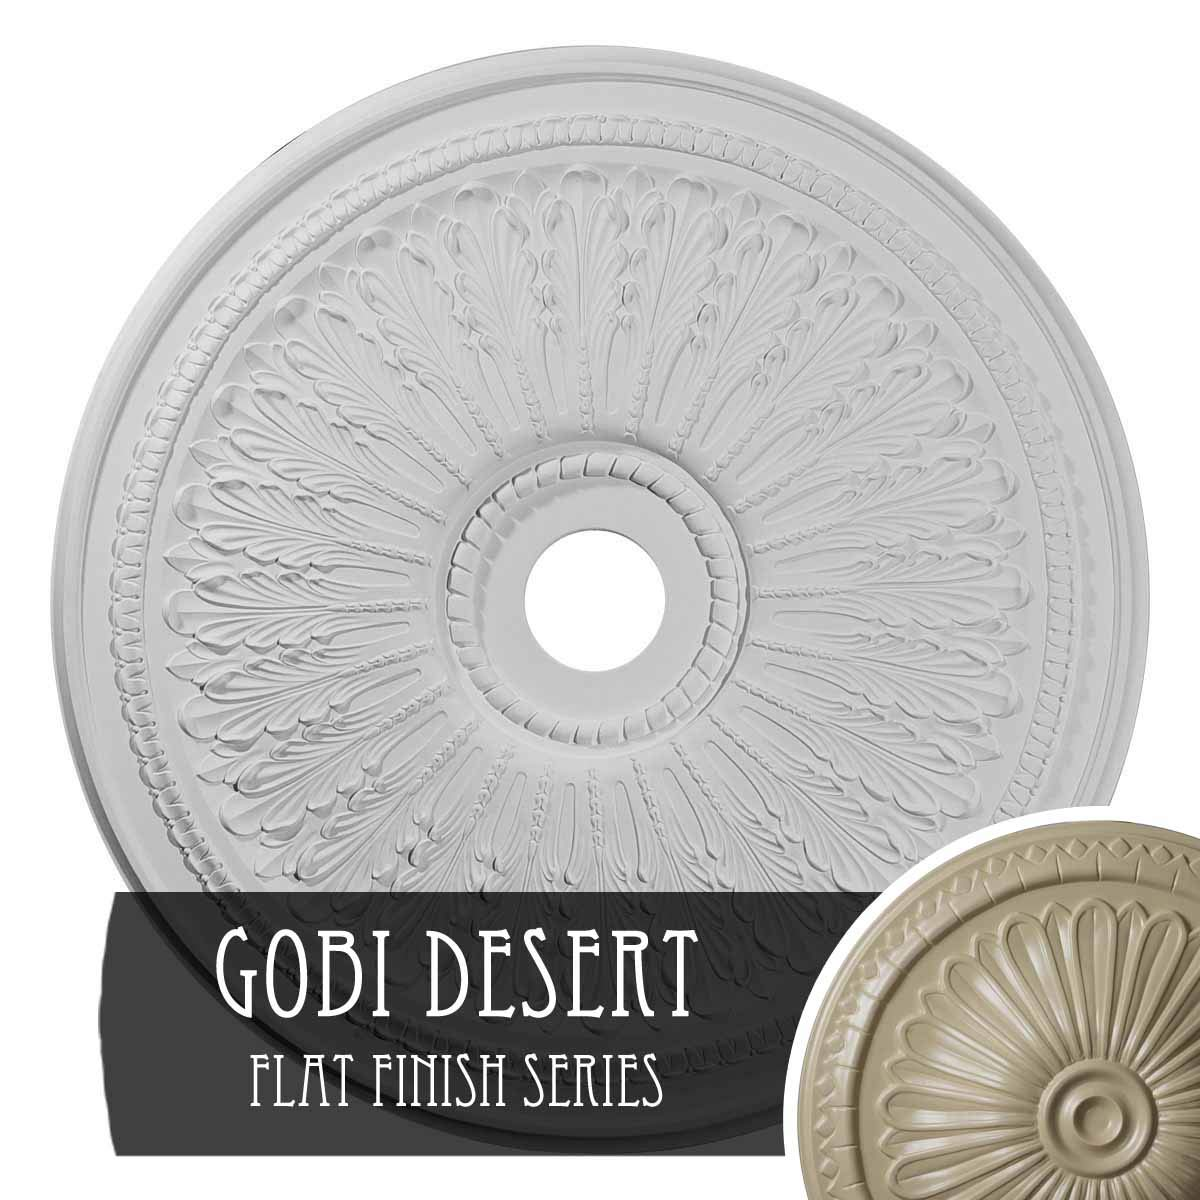 Ekena Millwork CM29OAGDF 29 1/8'' OD x 3 5/8'' ID x 1'' P Oak Leaf Ceiling Medallion fits Canopies up to 6 1/4'', Gobi Desert